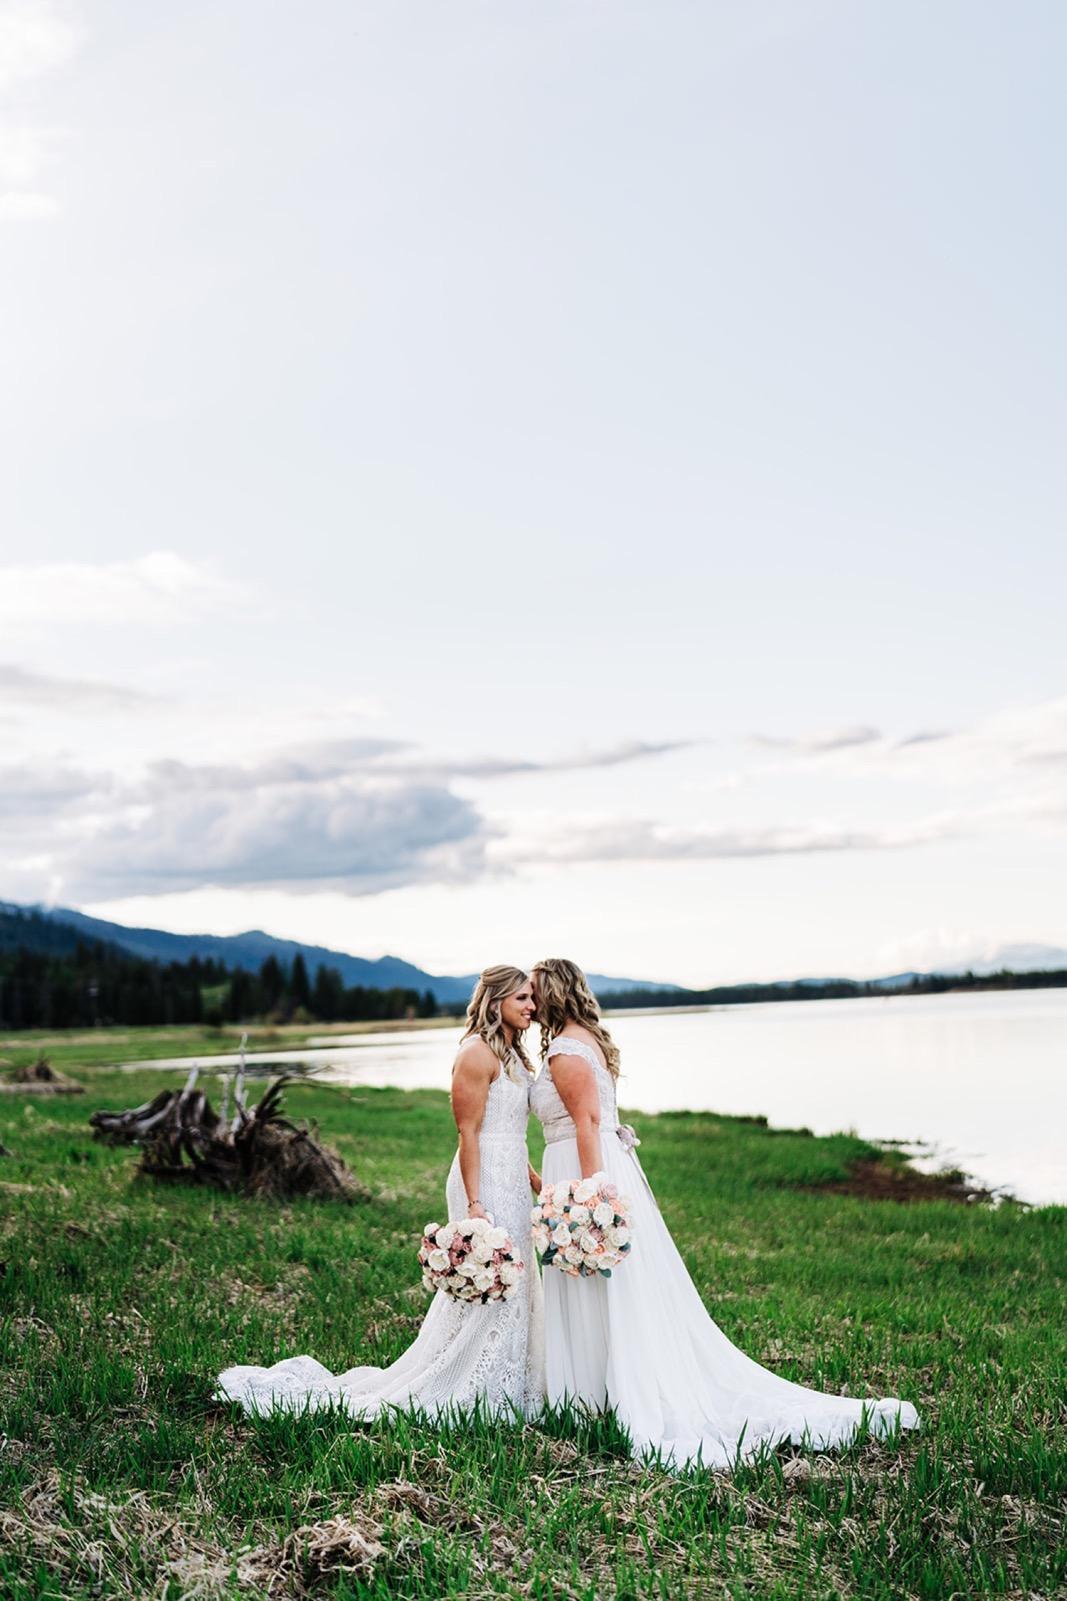 184_falissa_heather_wedding-526.jpg